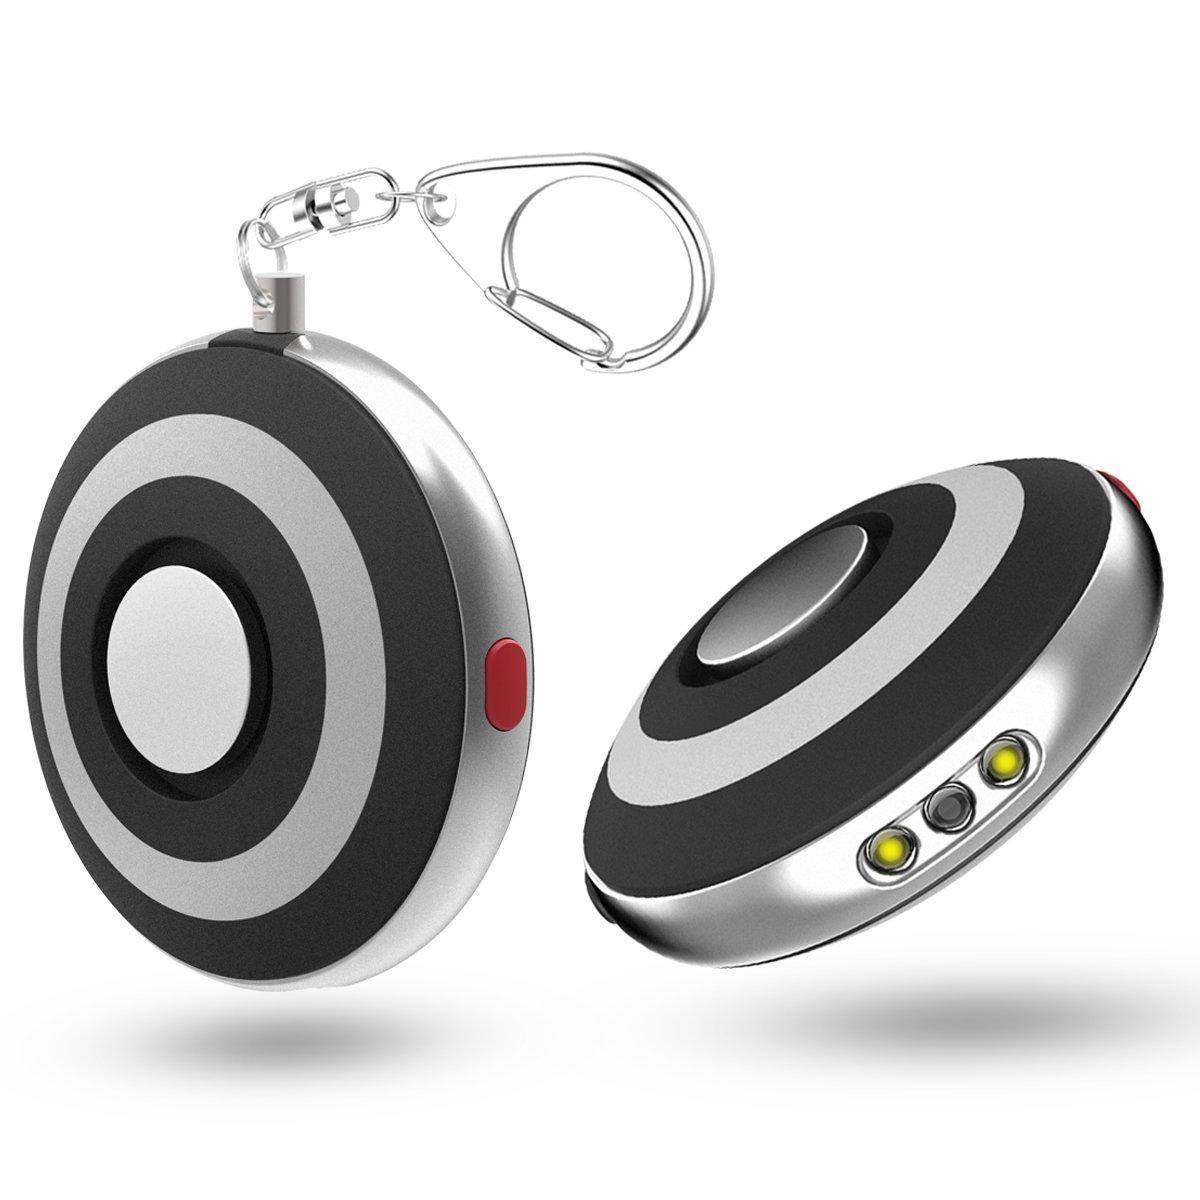 ASTUBIA Personal Alarm Keychain [2 pack] with LED Flashlight 125DB Self-Defense Safe Emergency Sound Siren Song Alarm for Women Kids Elderly Superior Explorer Protection -Black